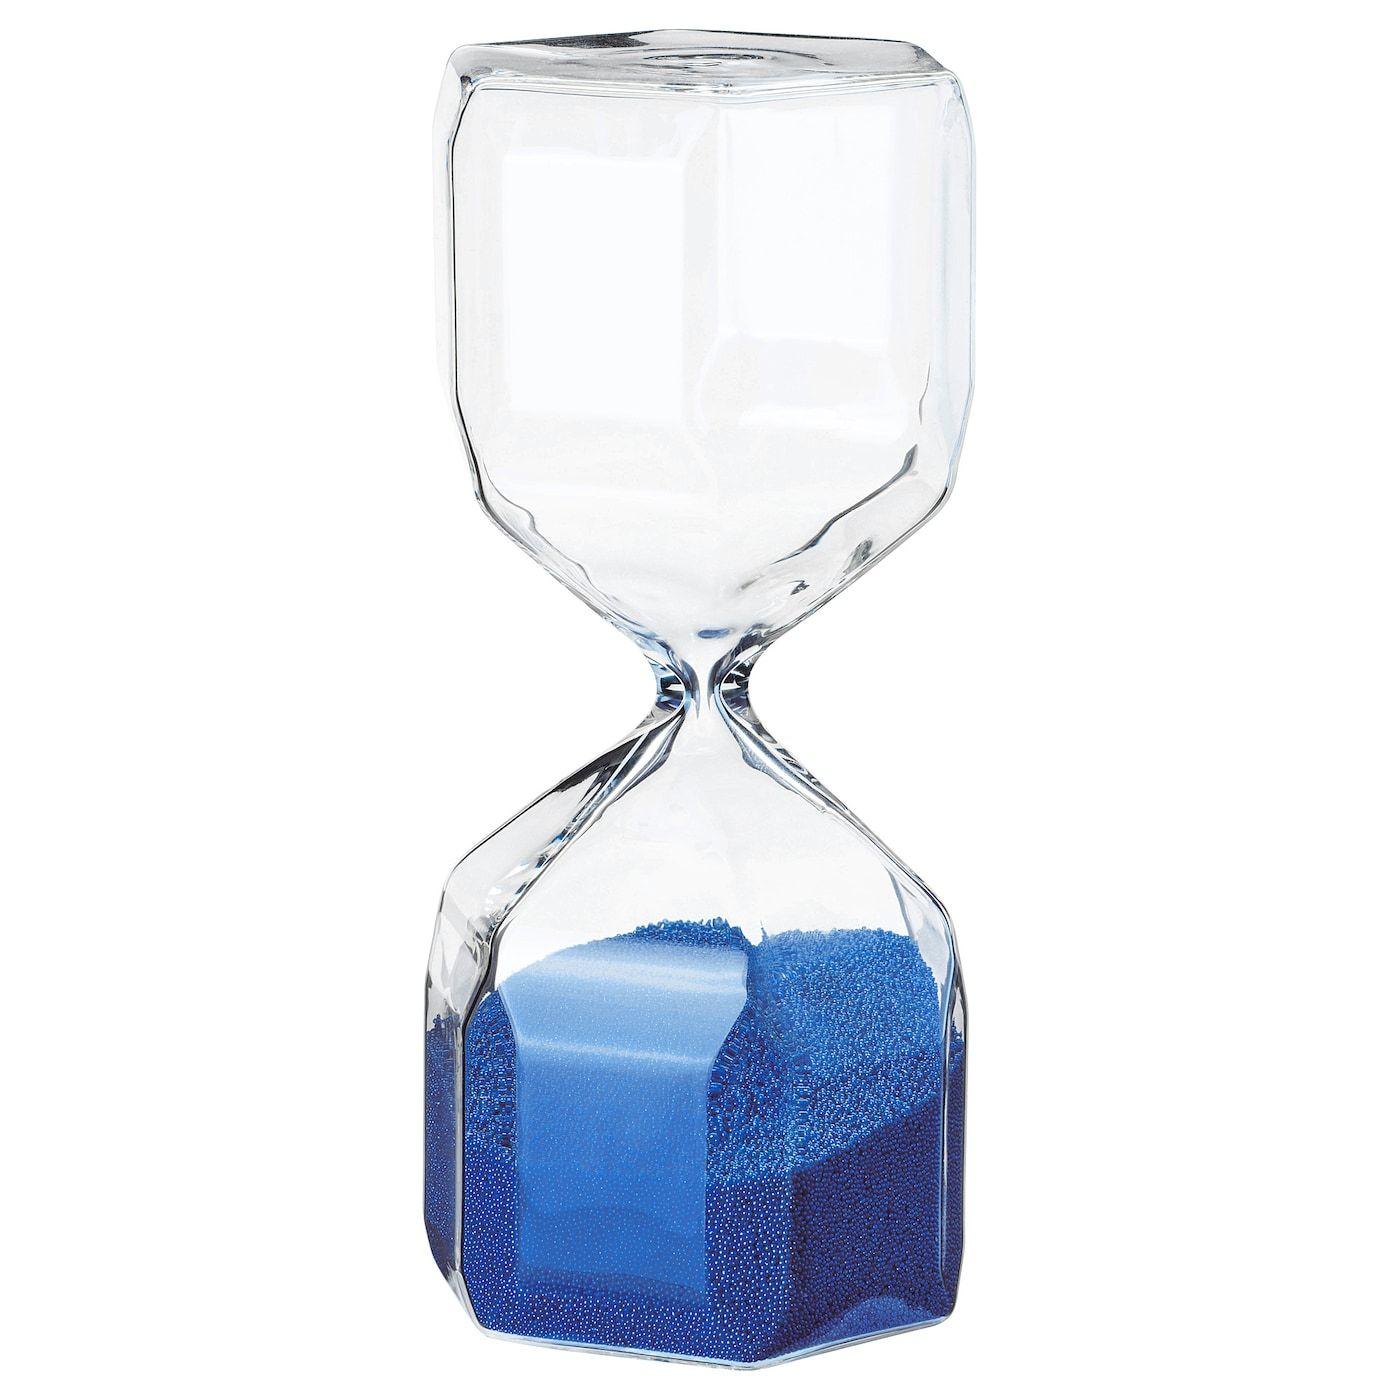 Tillsyn Decoratieve Zandloper Helder Glas Blauw Ikea Helder Glas Zandloper Glas